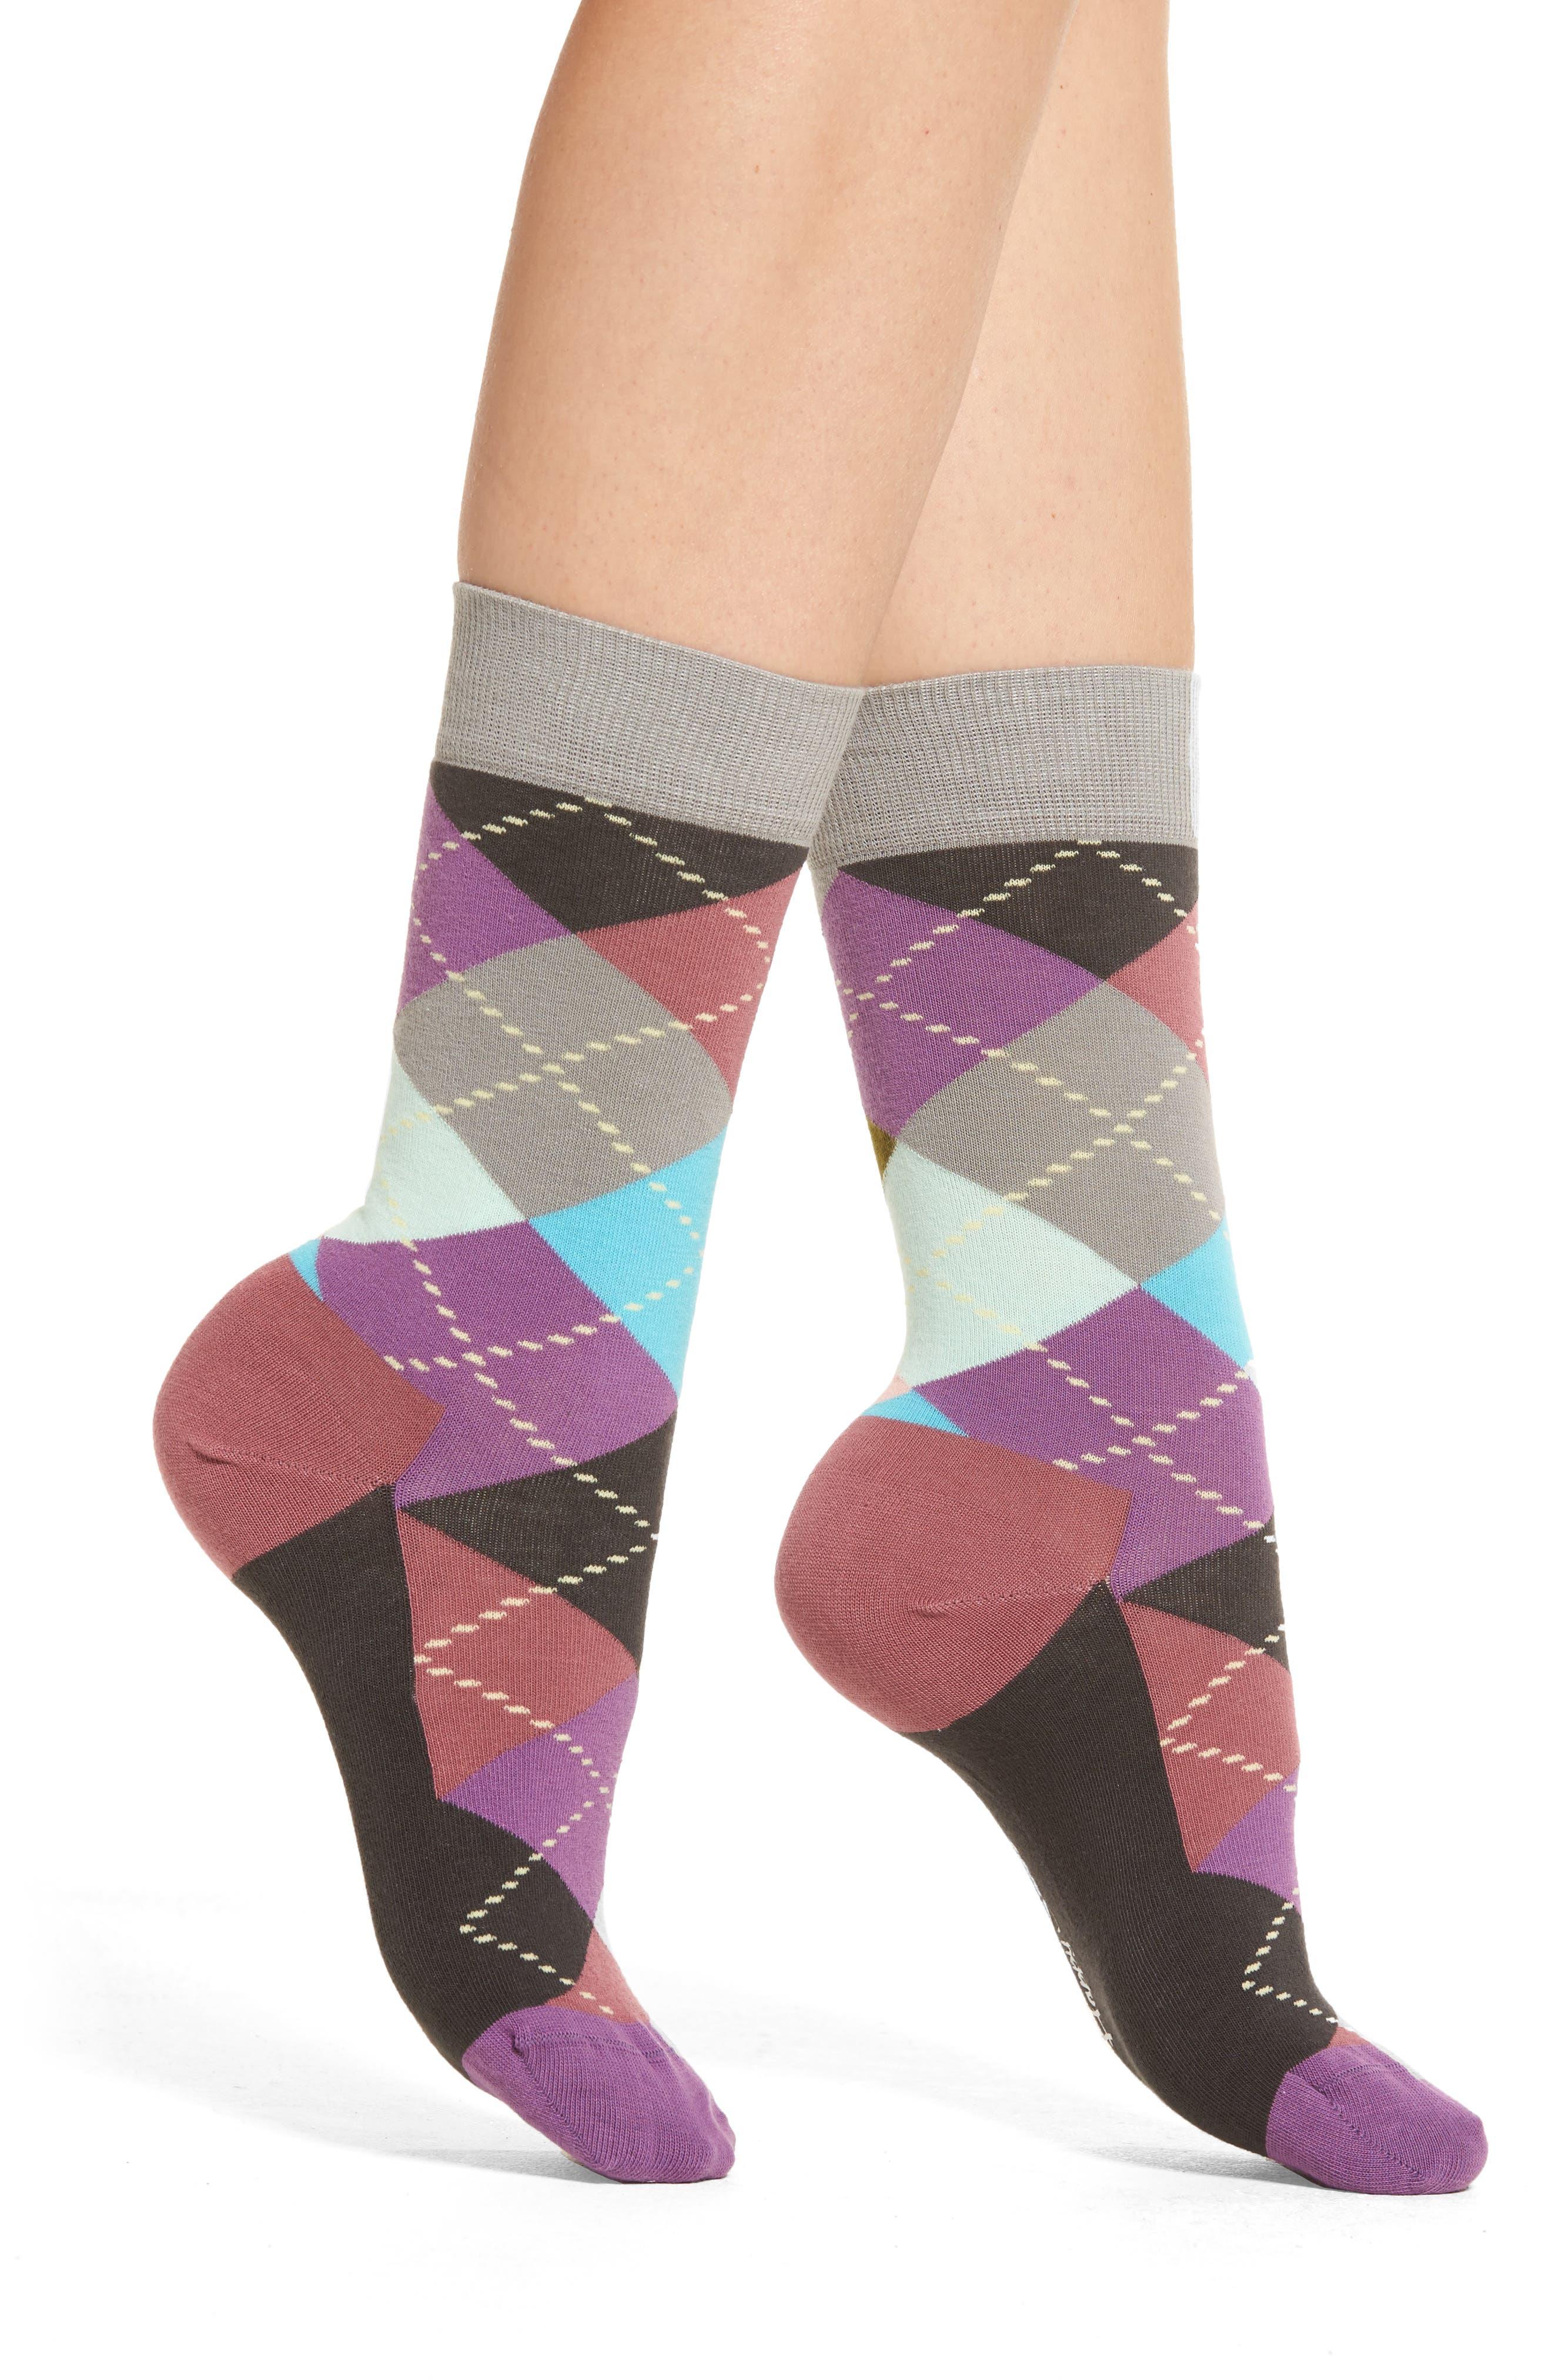 Happy Socks 'Checker' Low Cut Athletic Socks